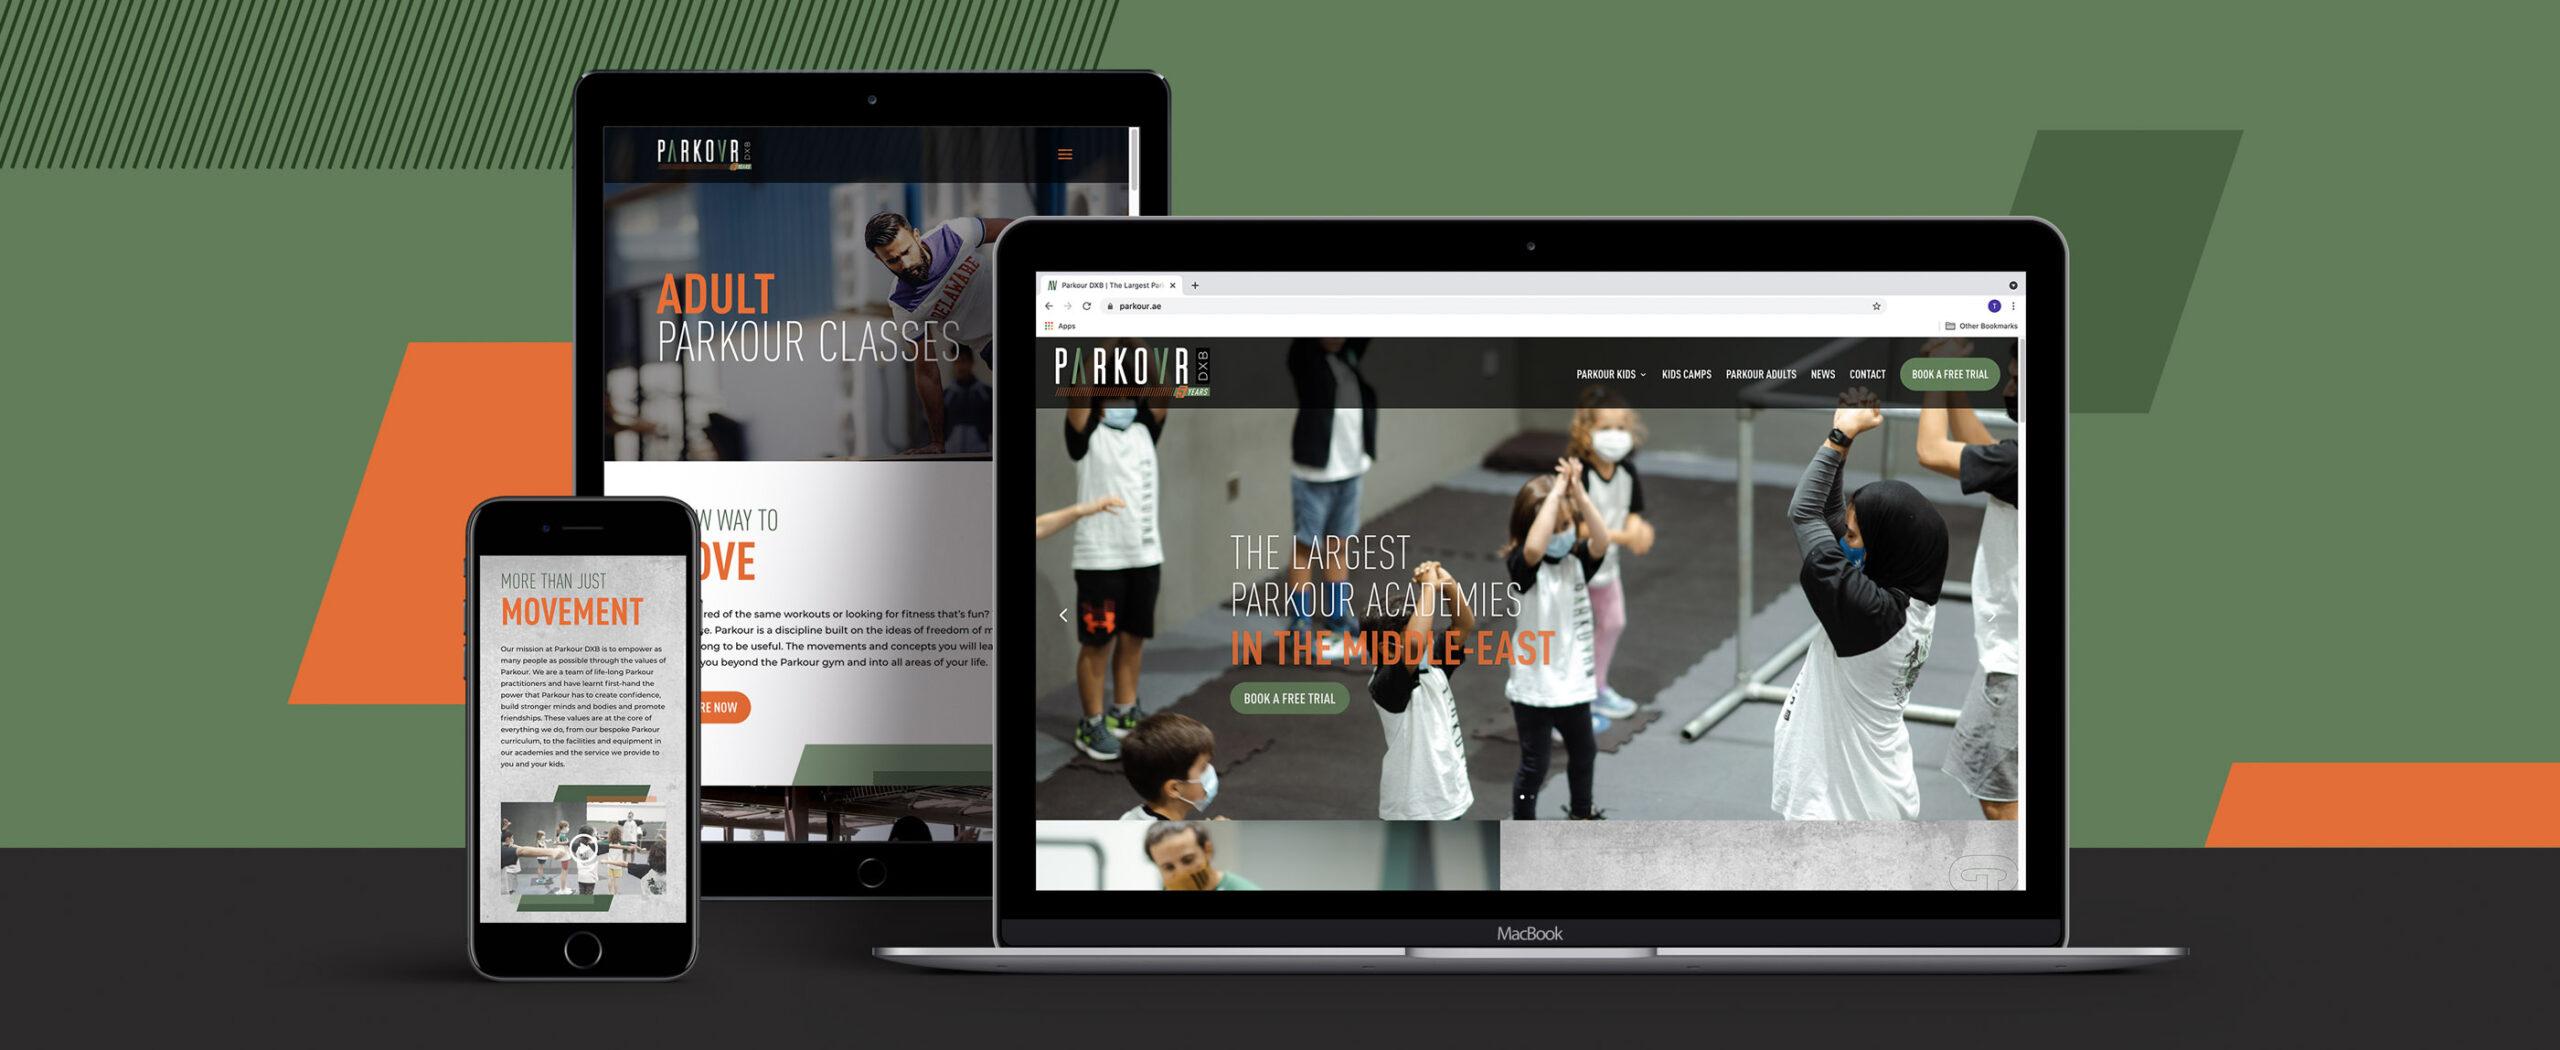 Parkour-Dubai-website-design-dubai-1